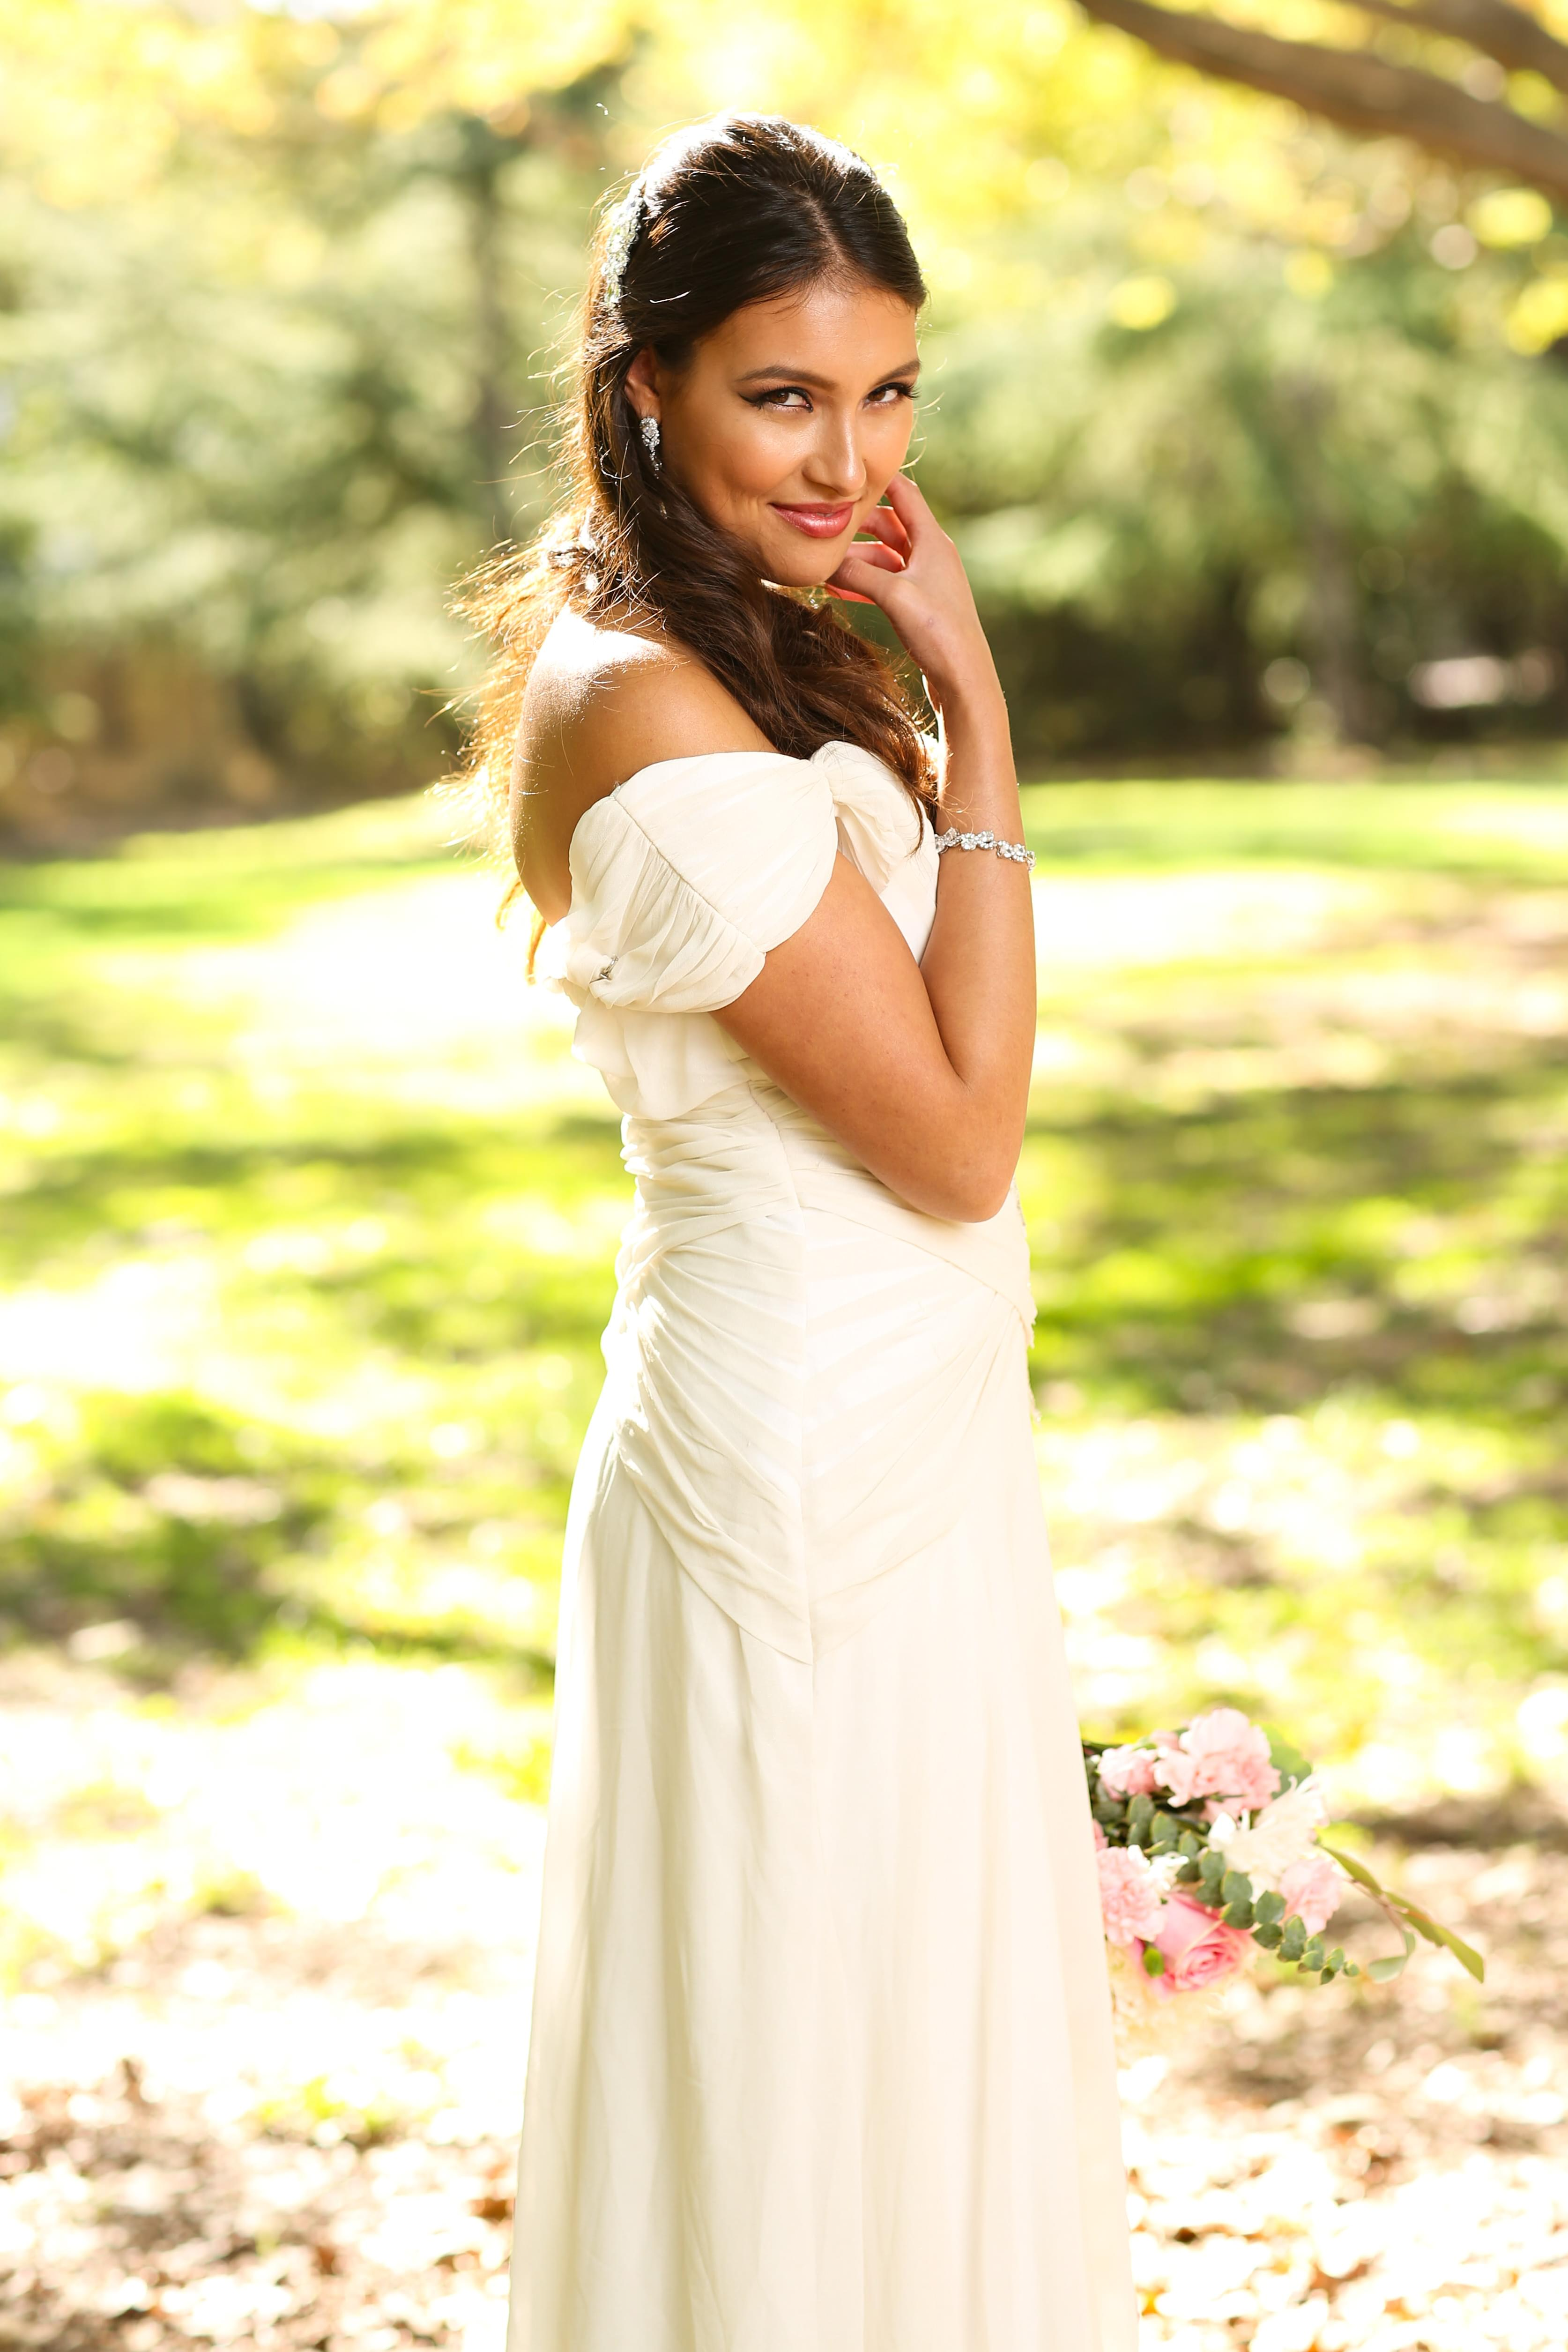 Novia Blanca biżuteria panna młoda zdjęcia (7)